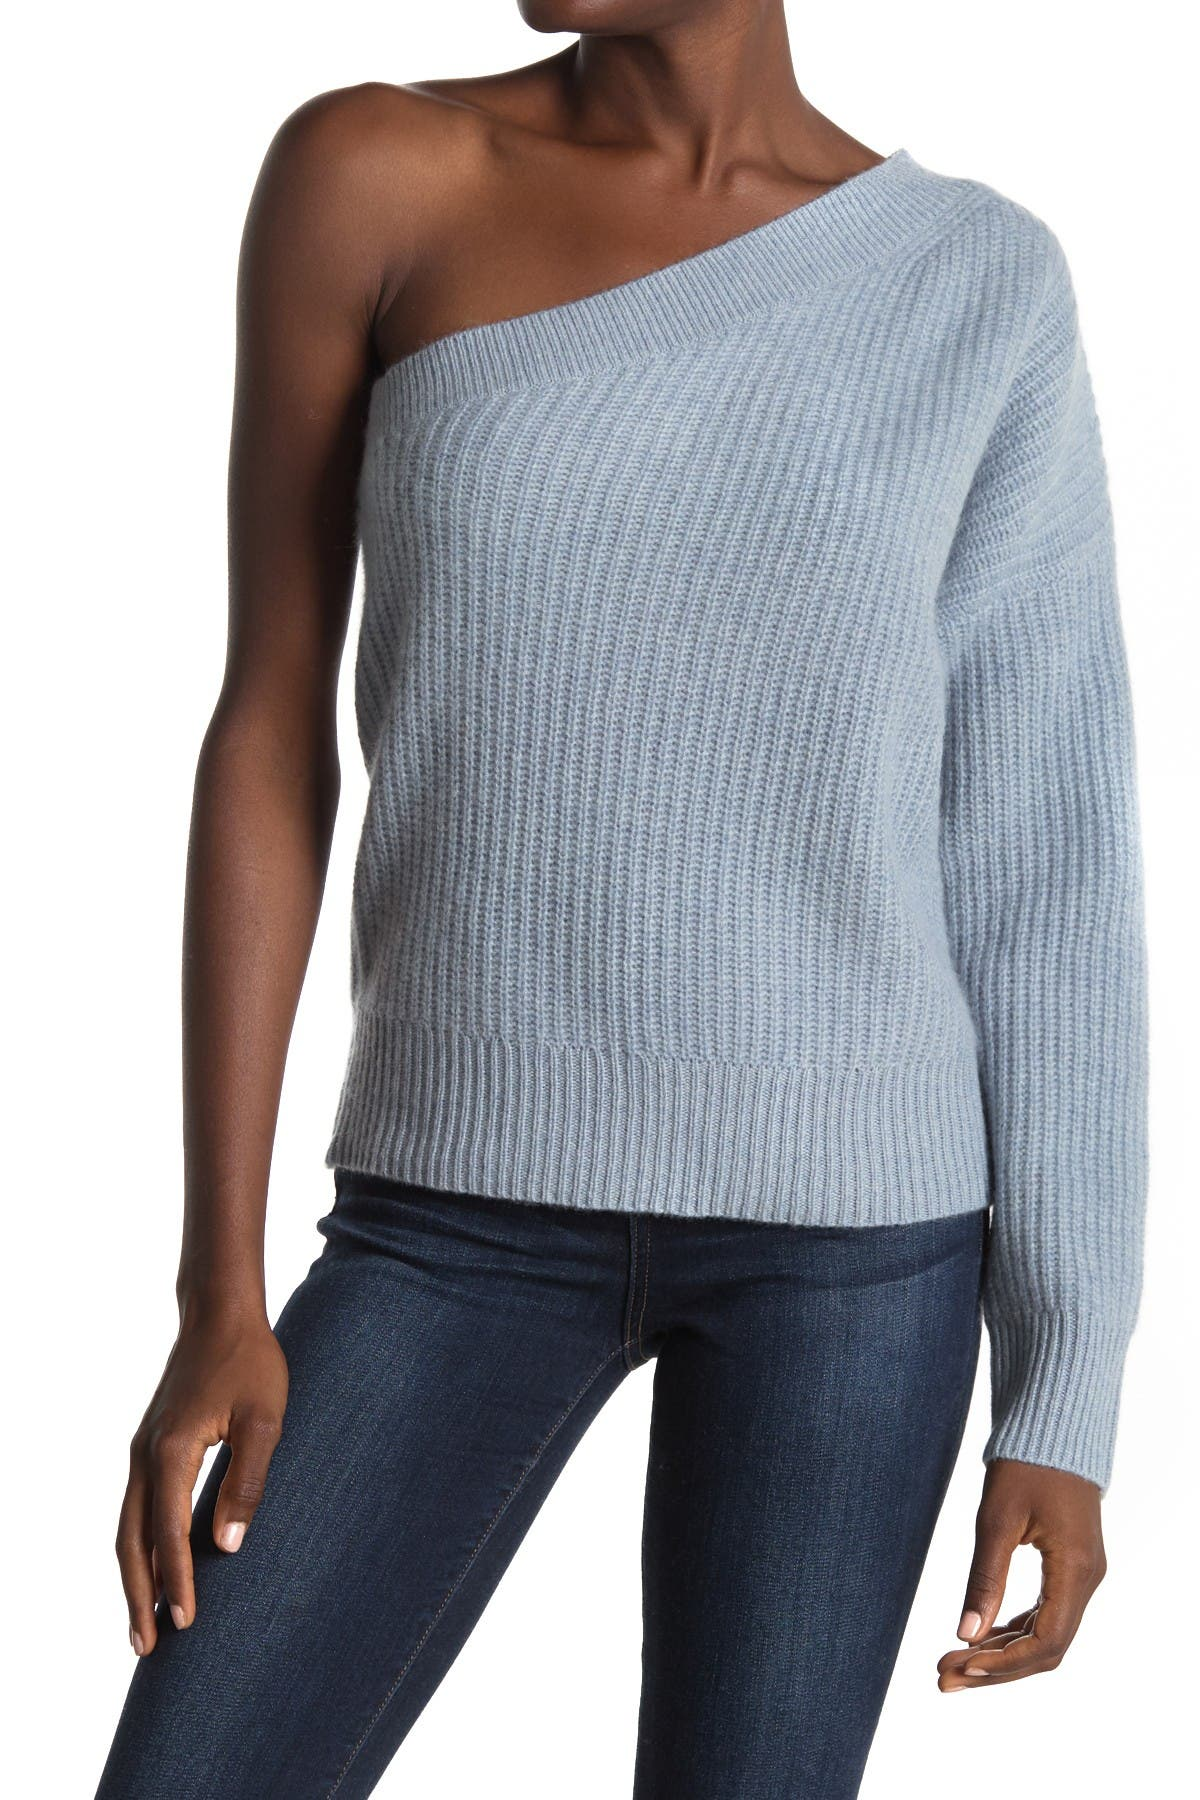 Image of 360 Cashmere Lena One Shoulder Cashmere Sweater